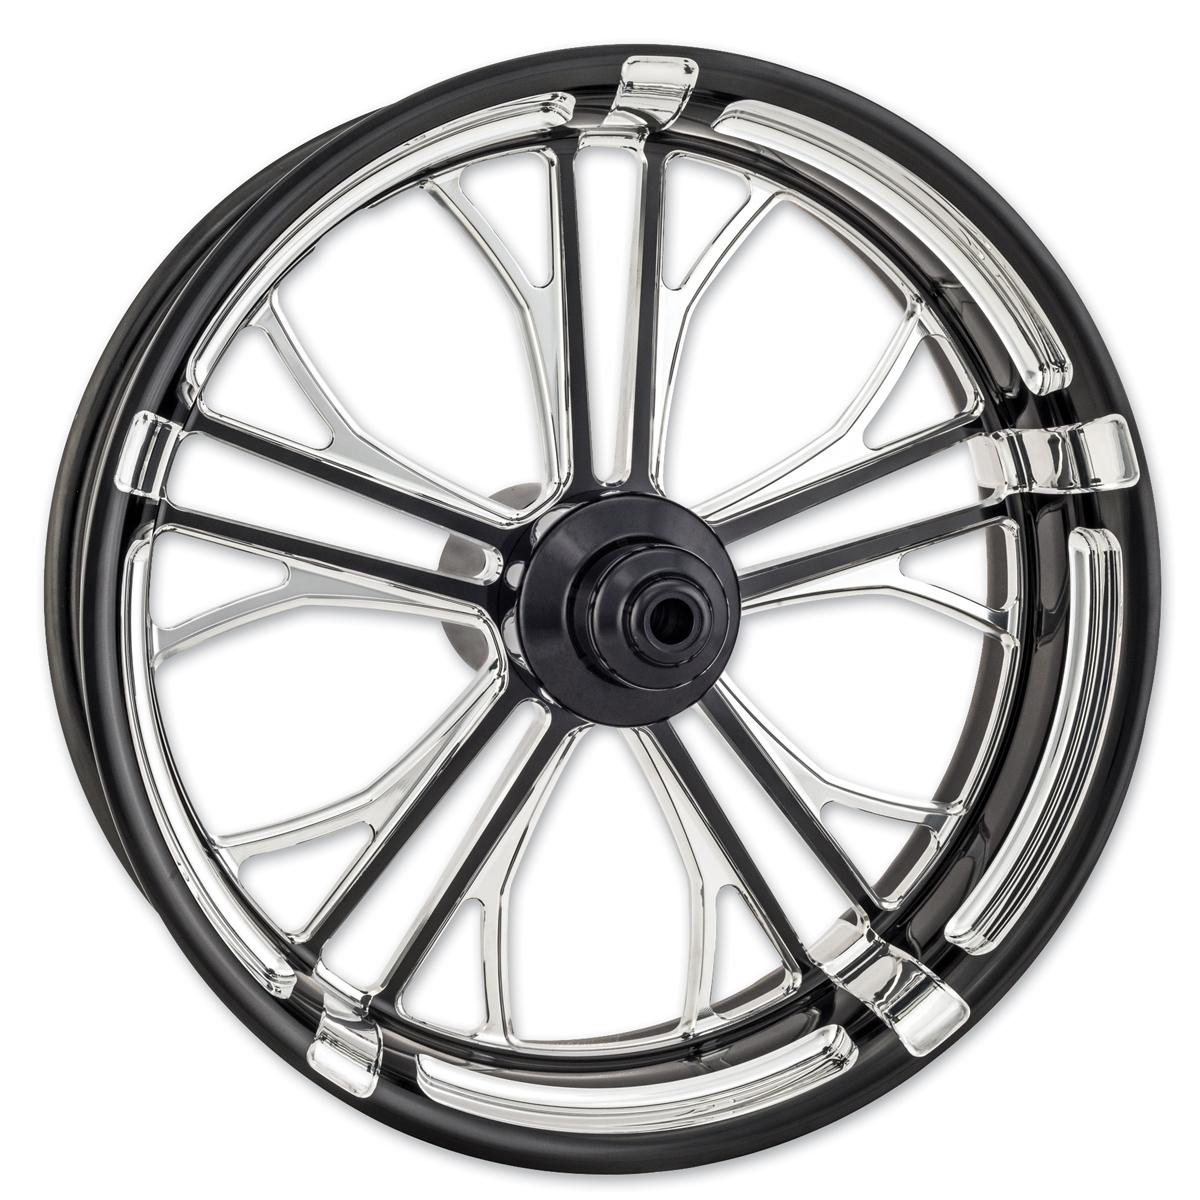 Performance Machine Dixon Platinum Cut Front Wheel 21x3.5 ABS